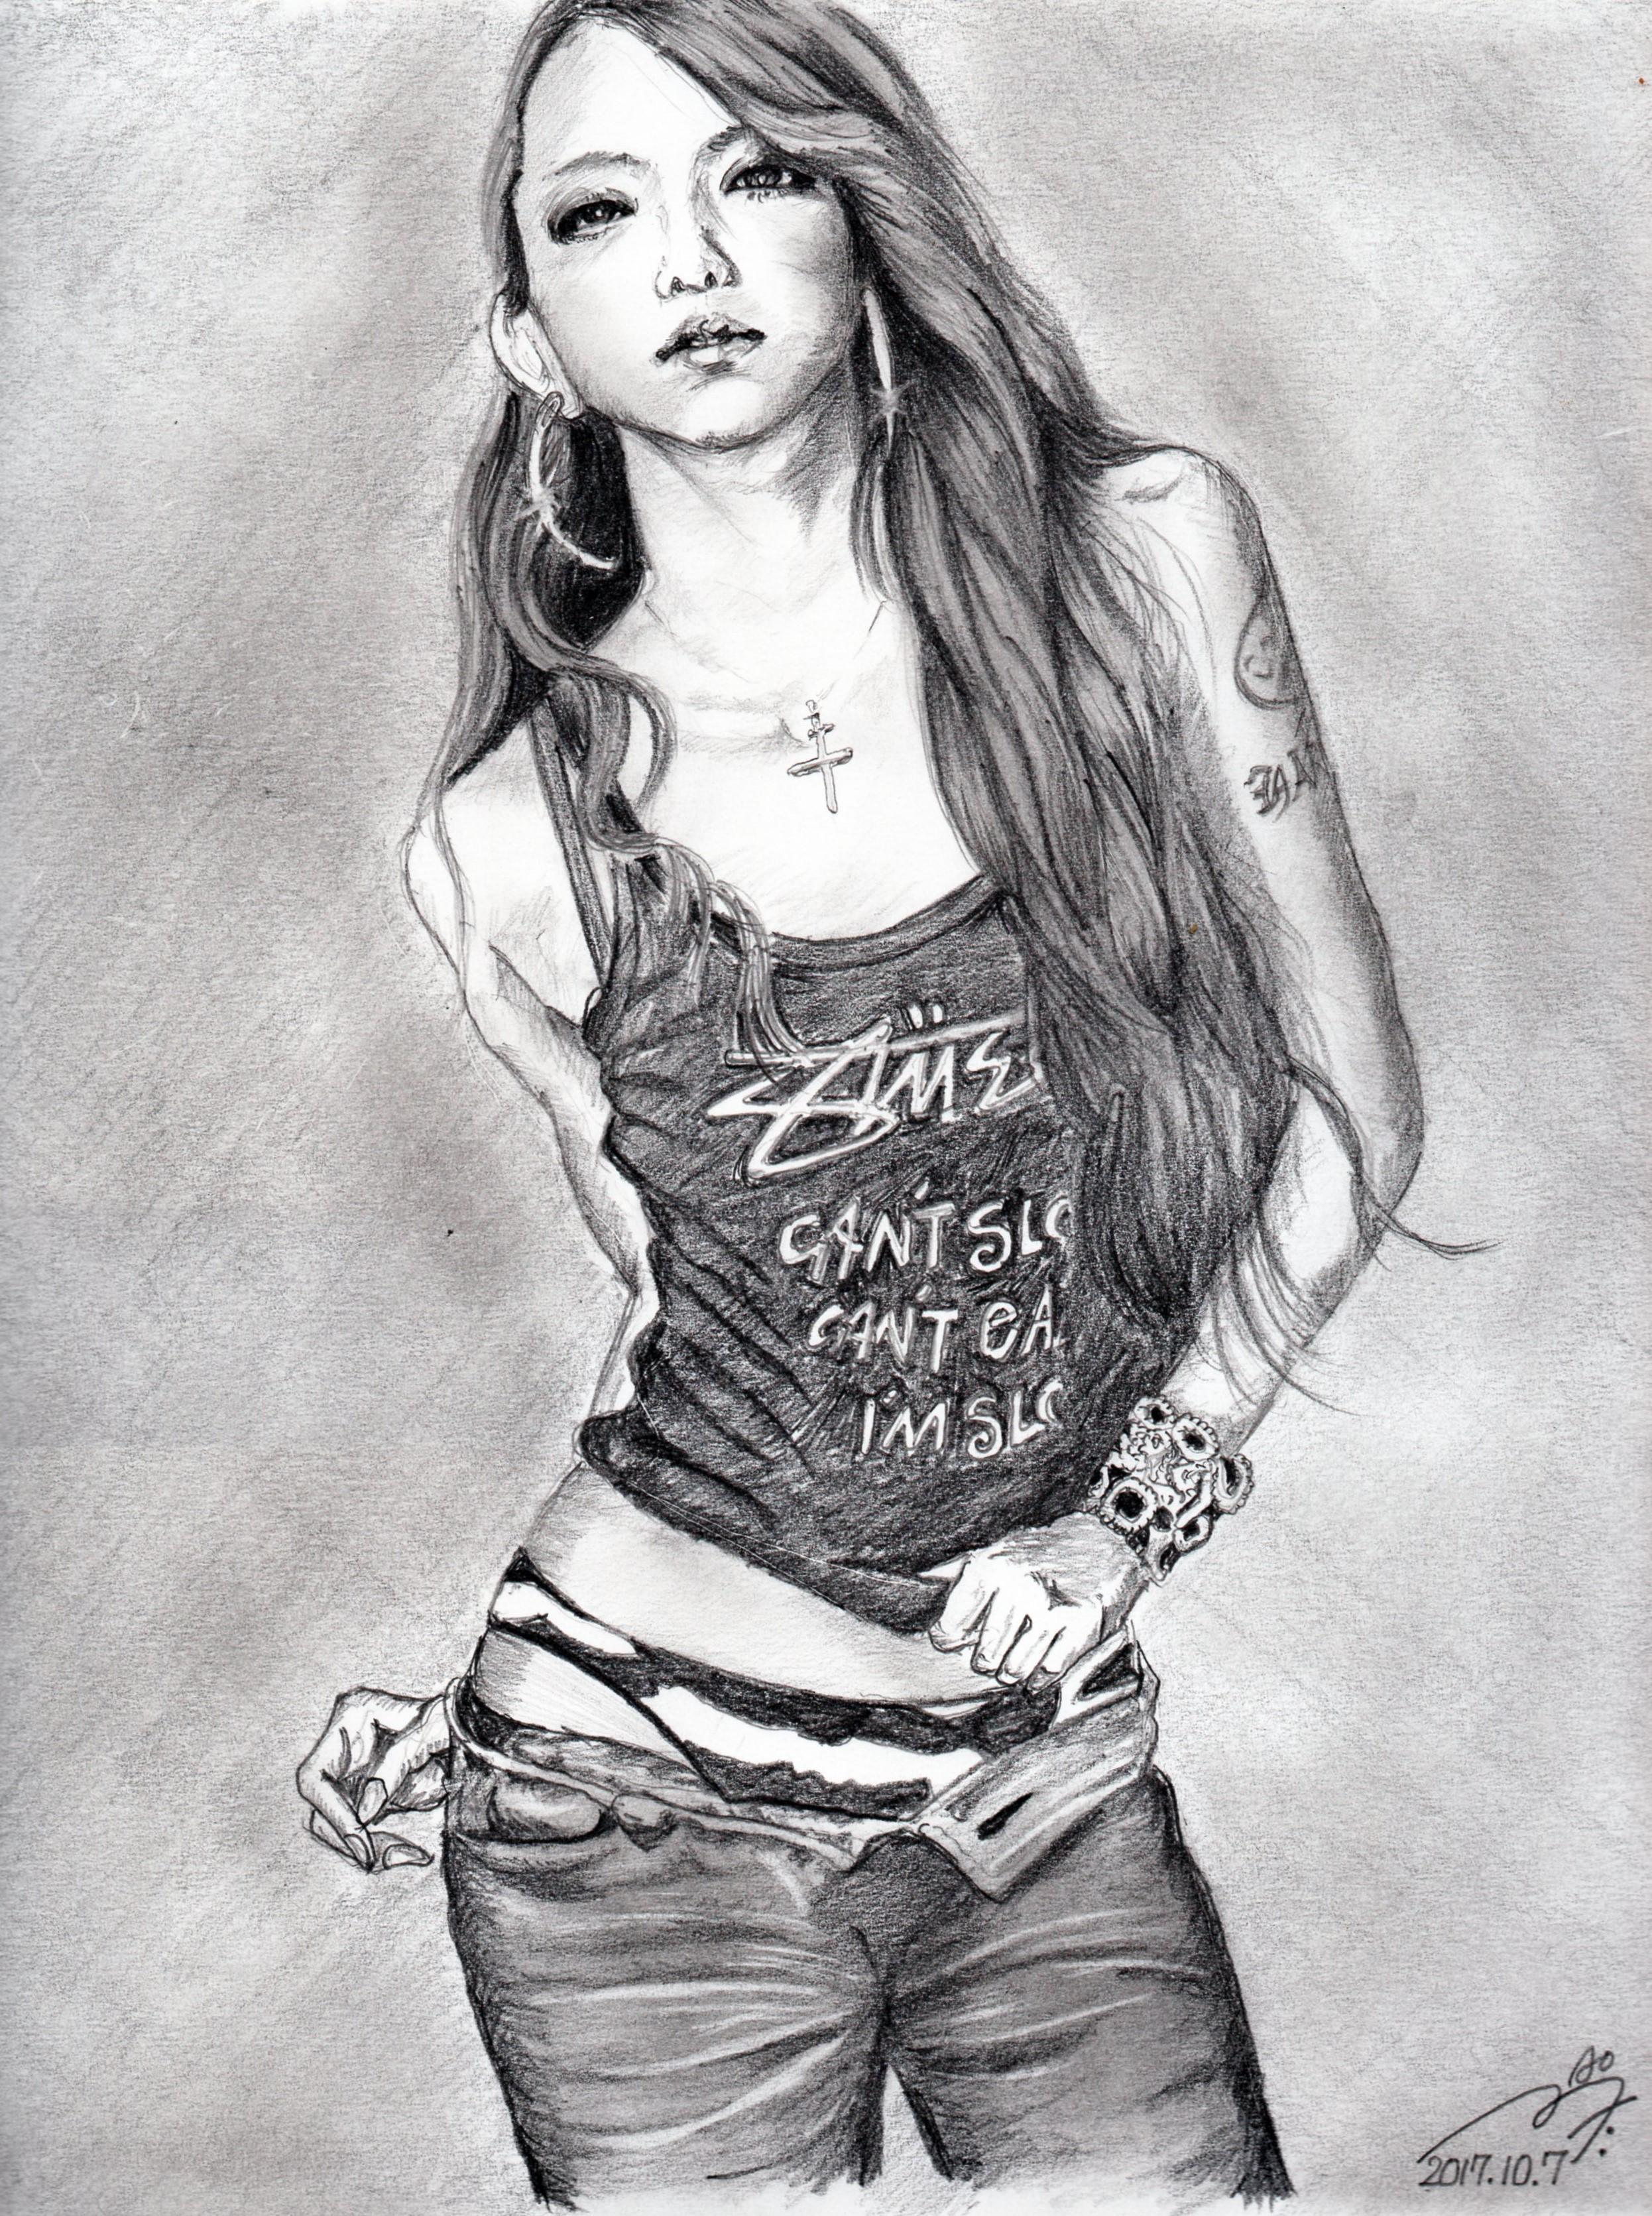 安室奈美恵の鉛筆画似顔絵